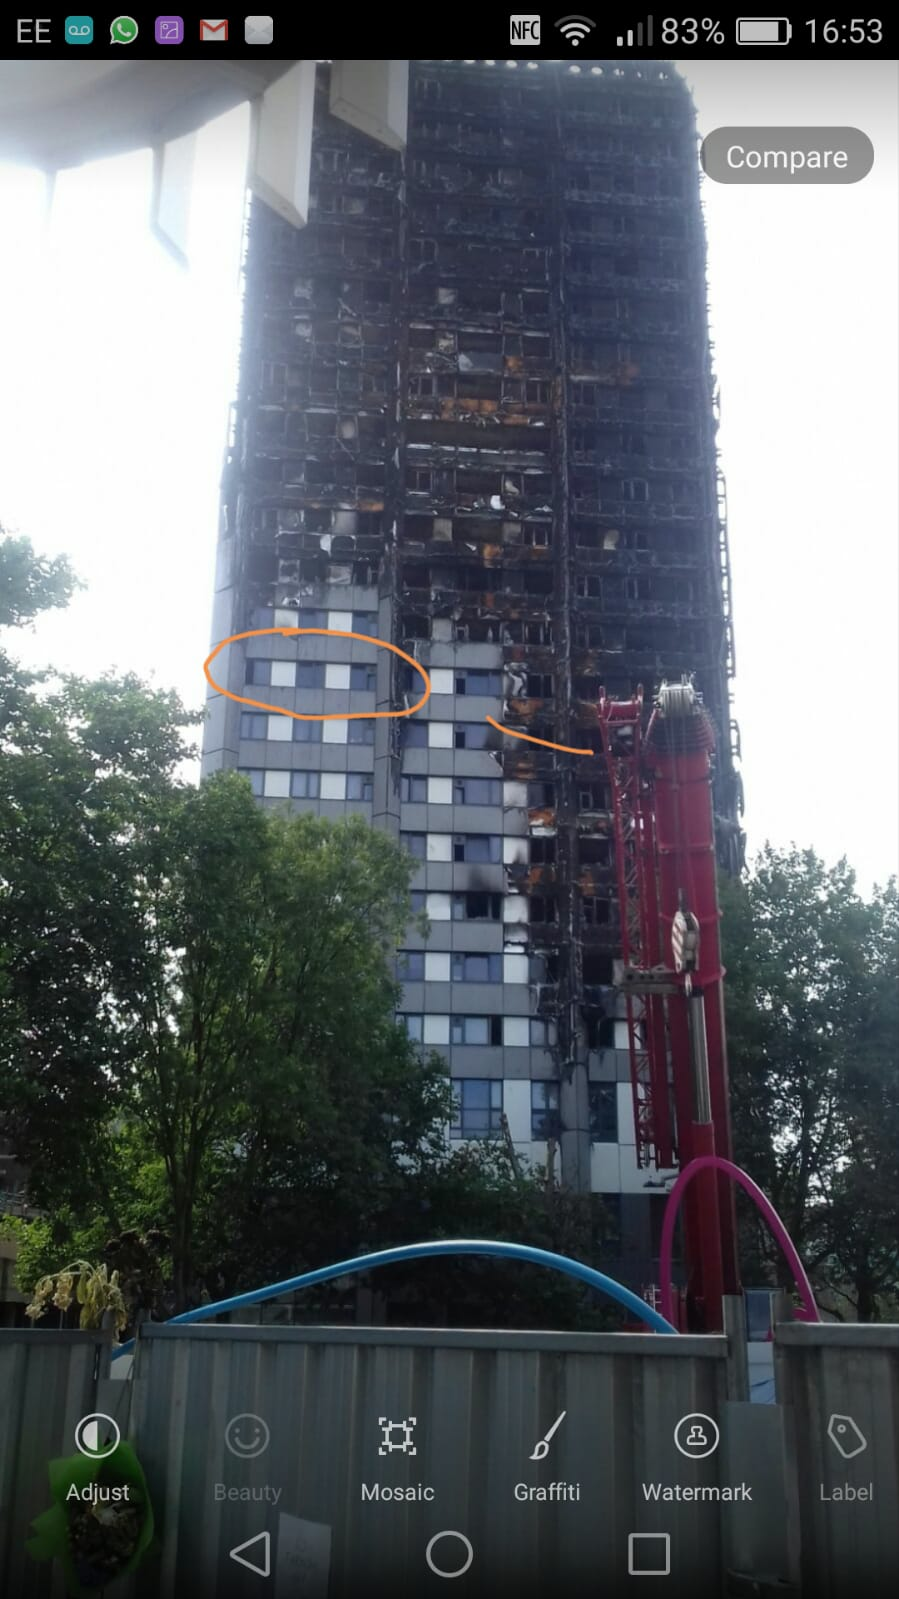 sopravvissuto incendio grenfell tower